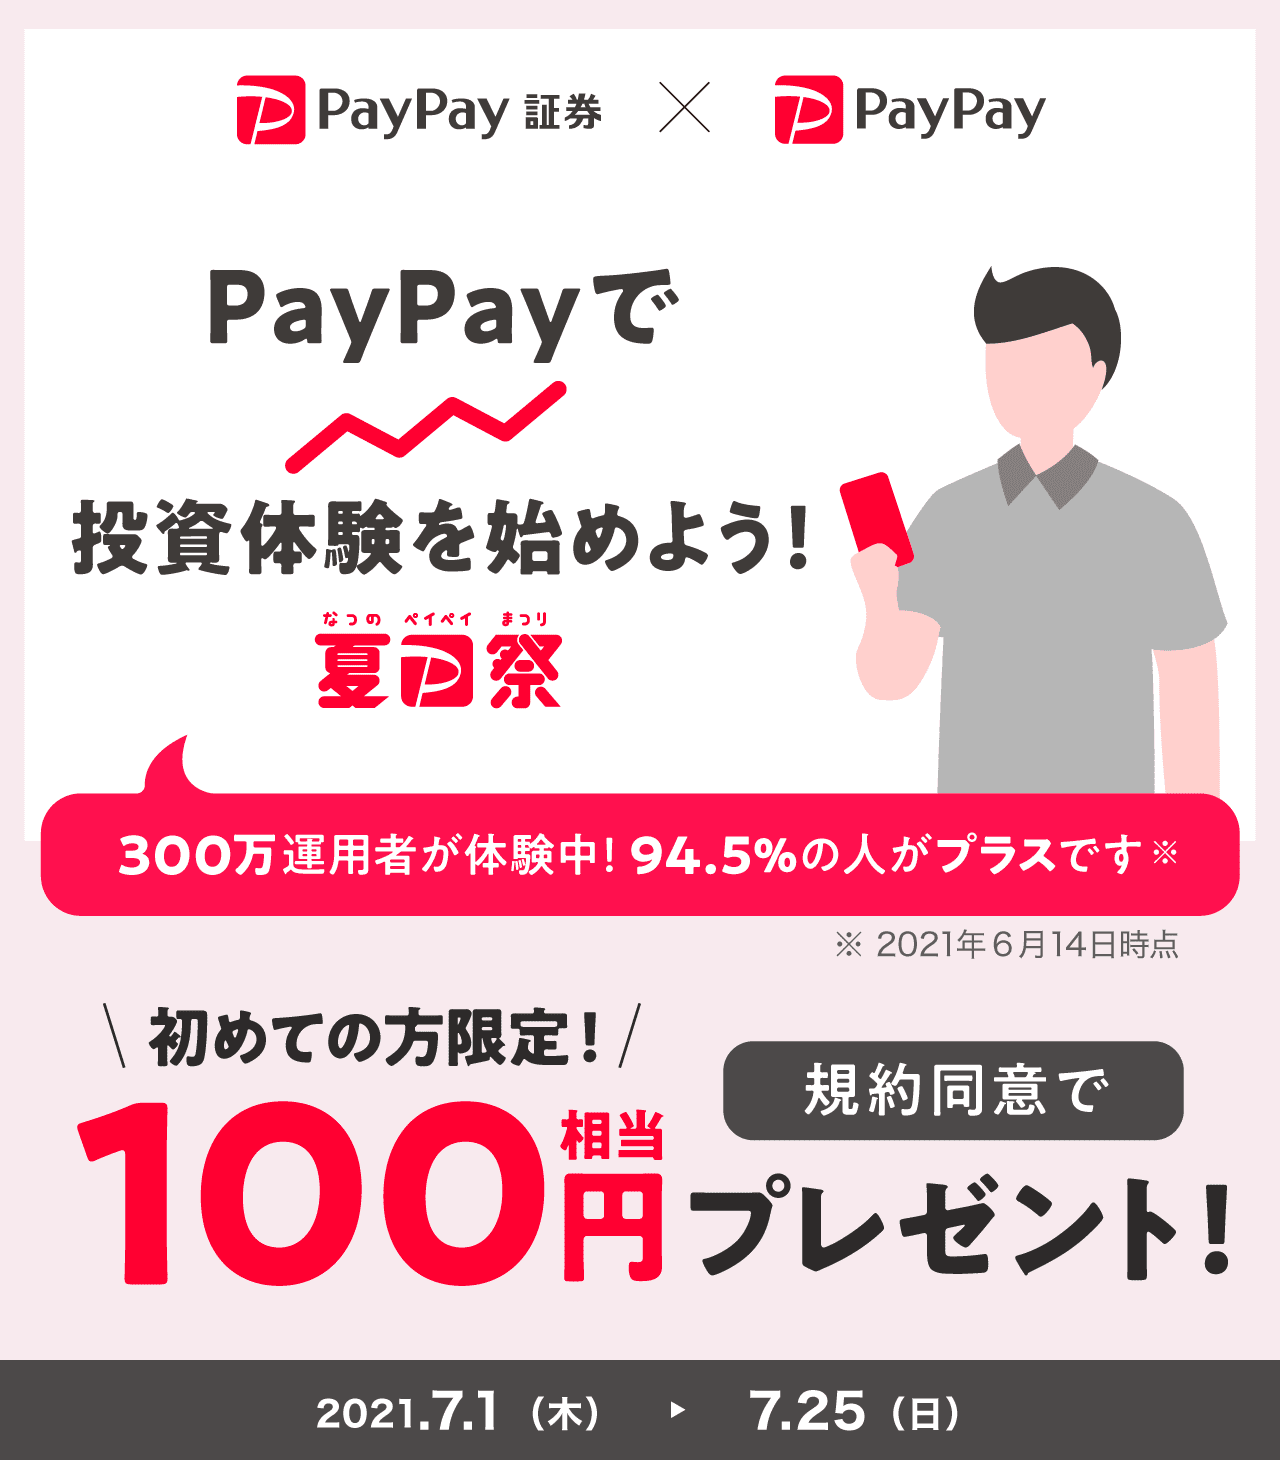 PayPayで投資体験を始めよう! 初めての方限定!規約同意で100円相当プレゼント!